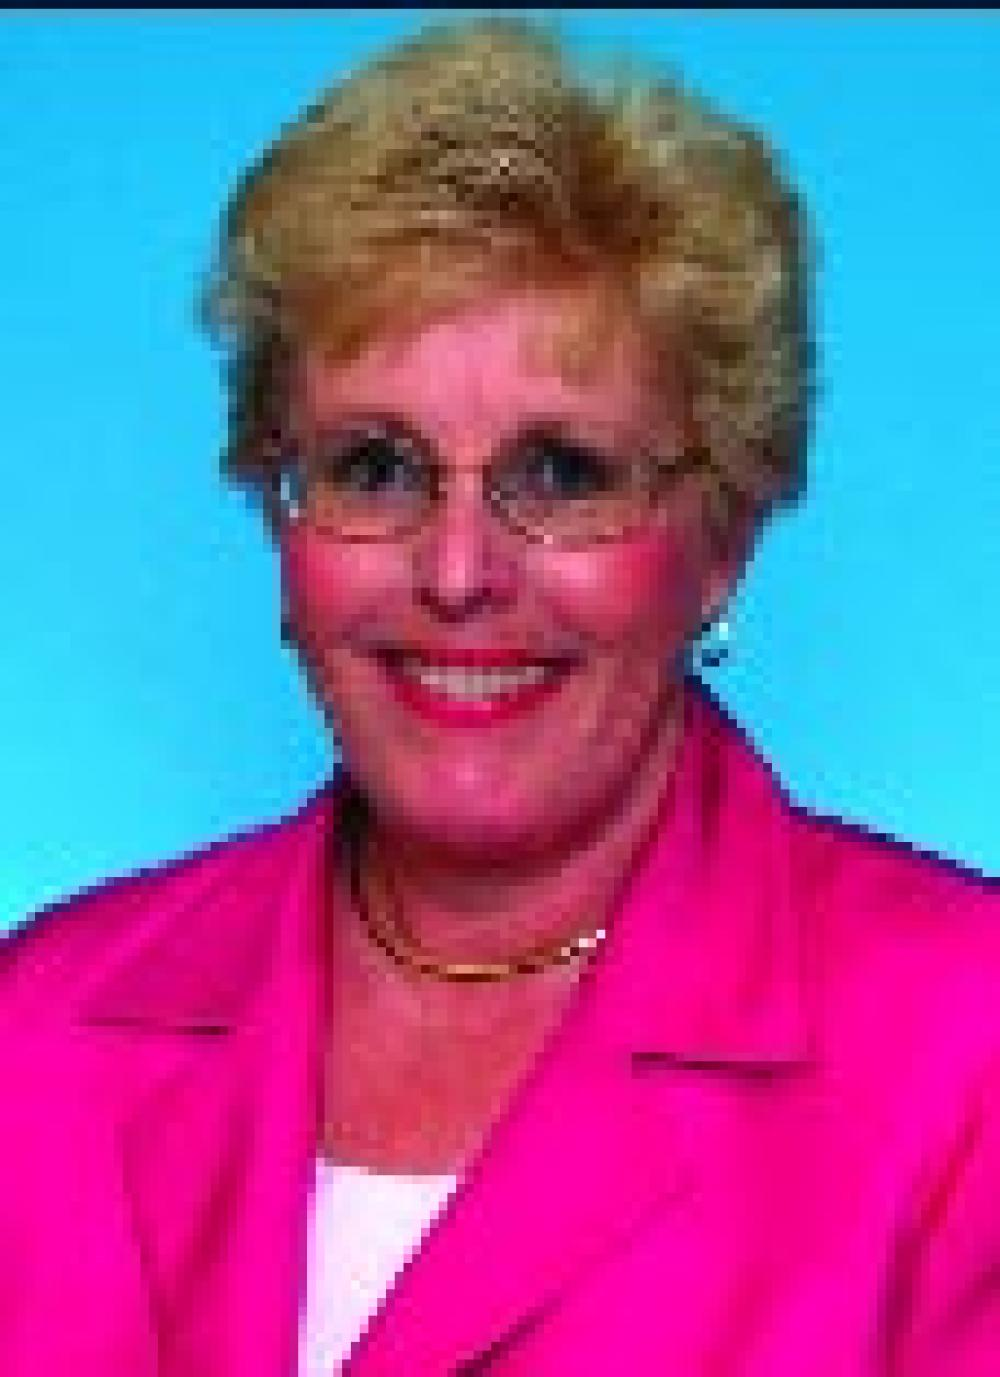 Ruth Jonen